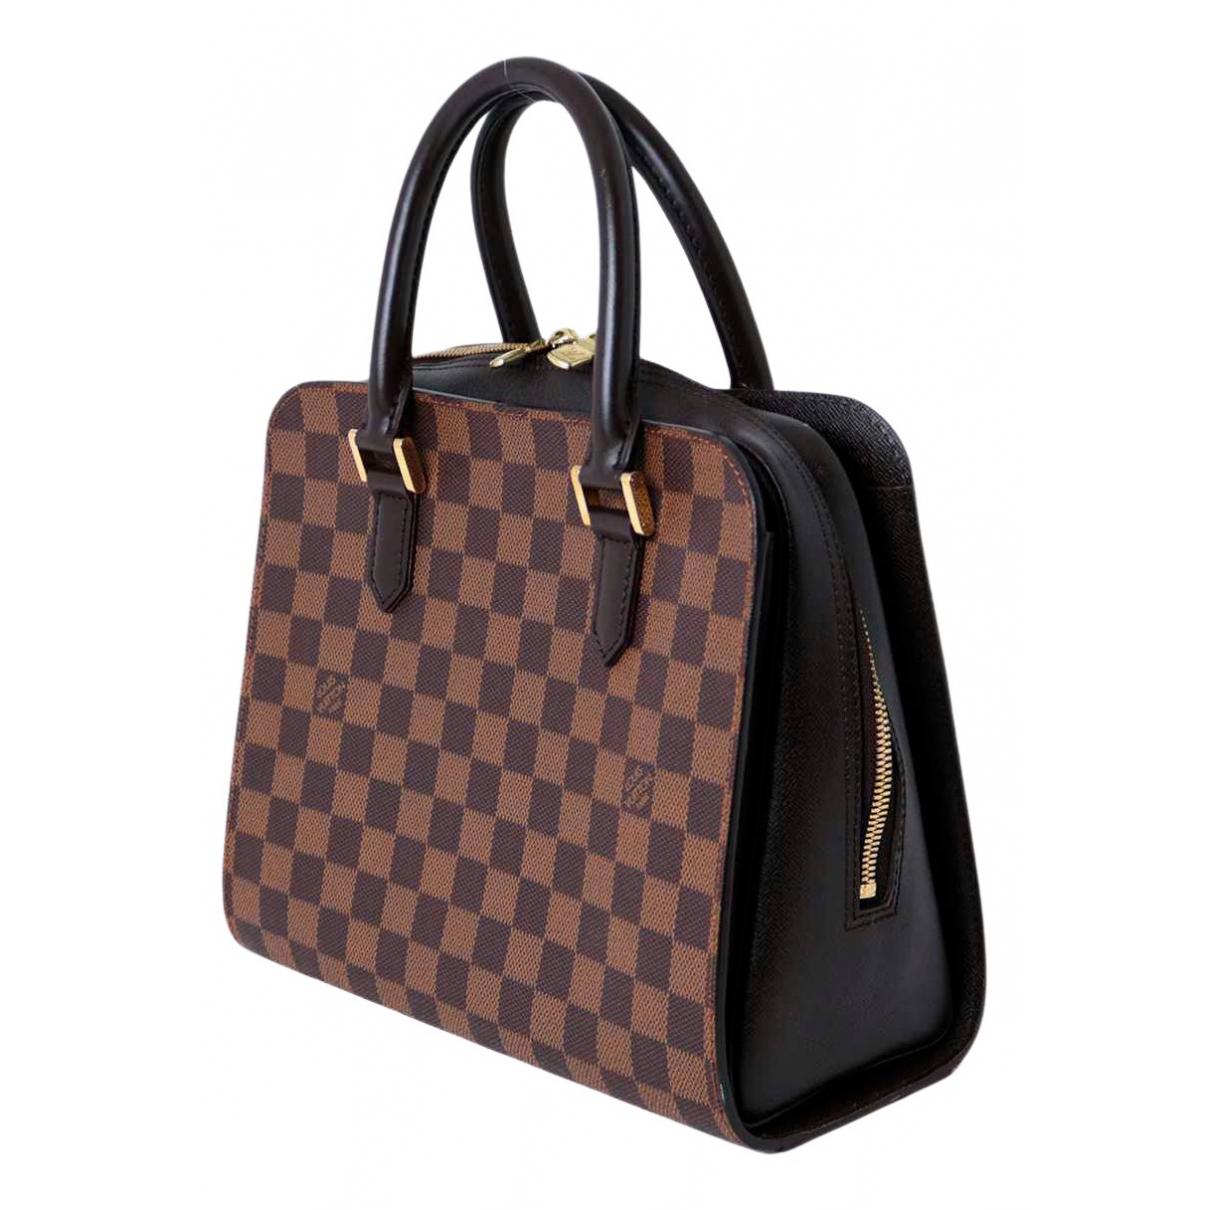 Louis Vuitton - Sac a main Triana pour femme en toile - marron